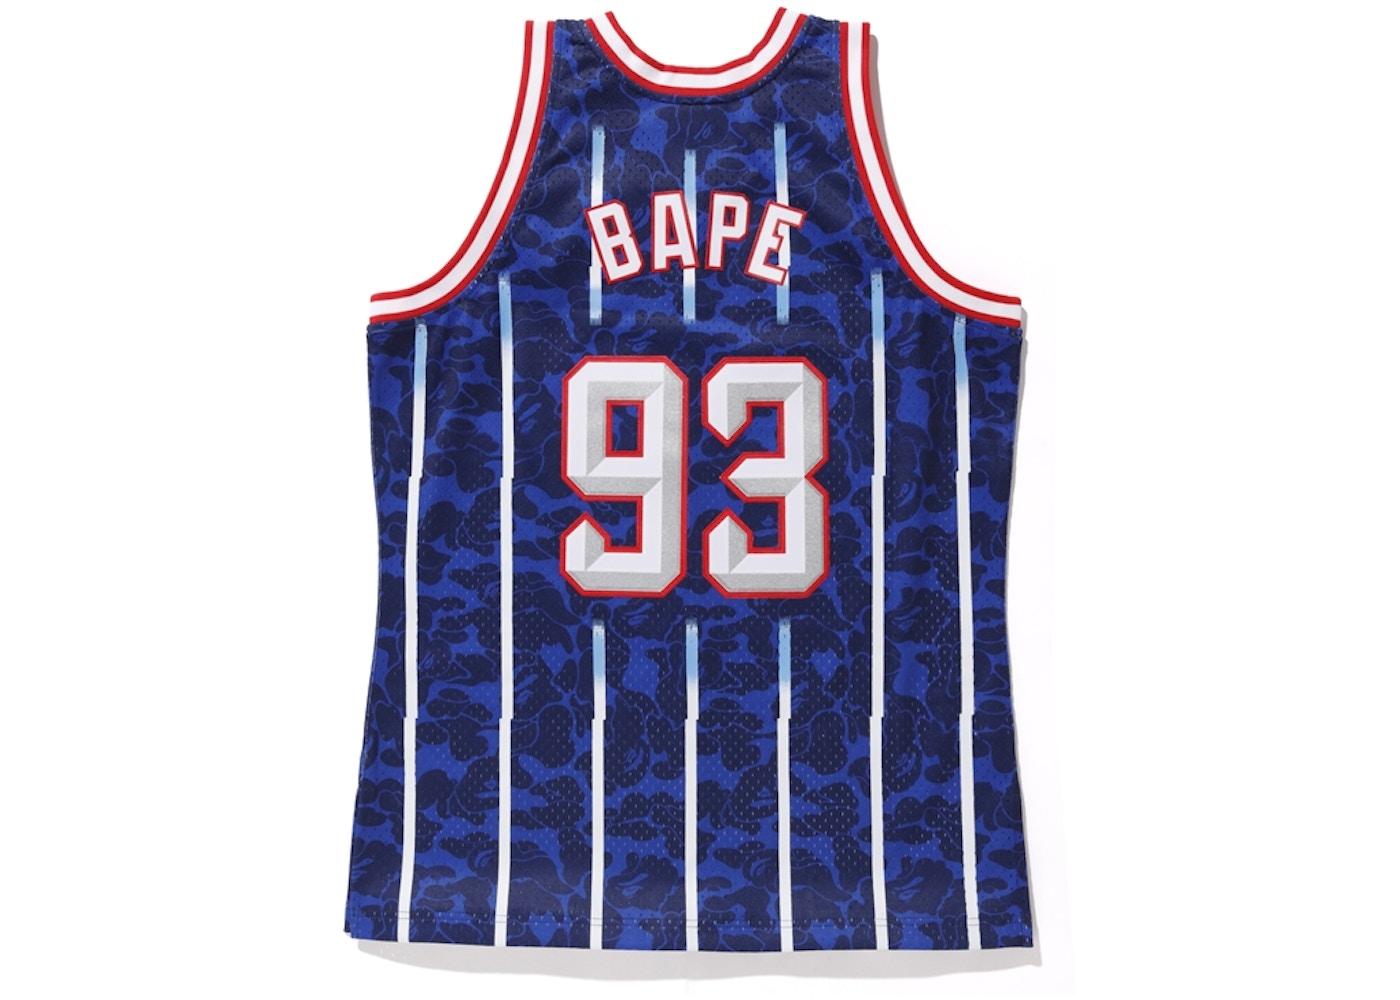 c42065dd Streetwear - Bape Tops/Sweatshirts - Price Premium